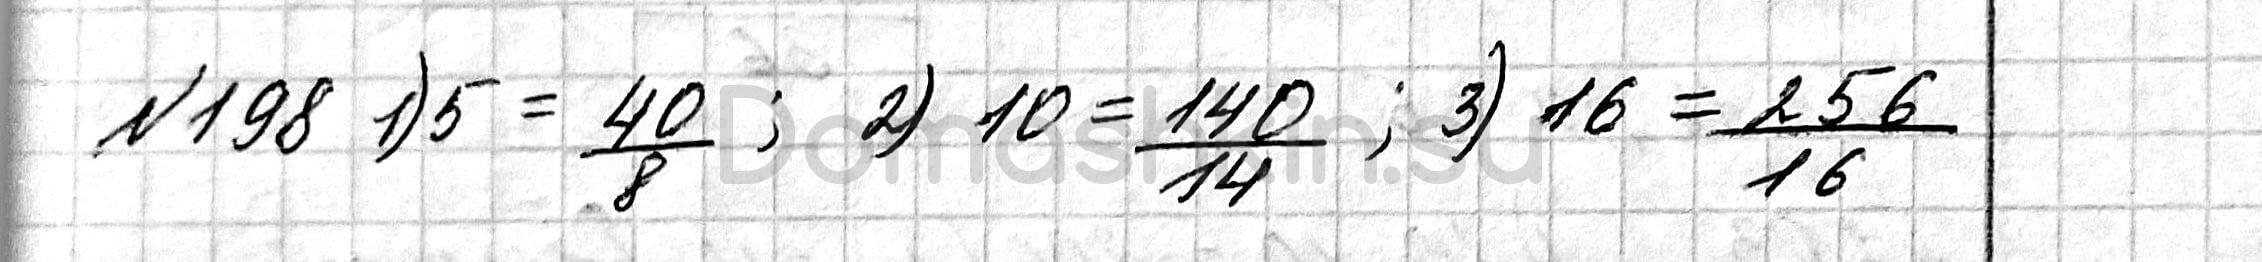 Математика 6 класс учебник Мерзляк номер 198 решение